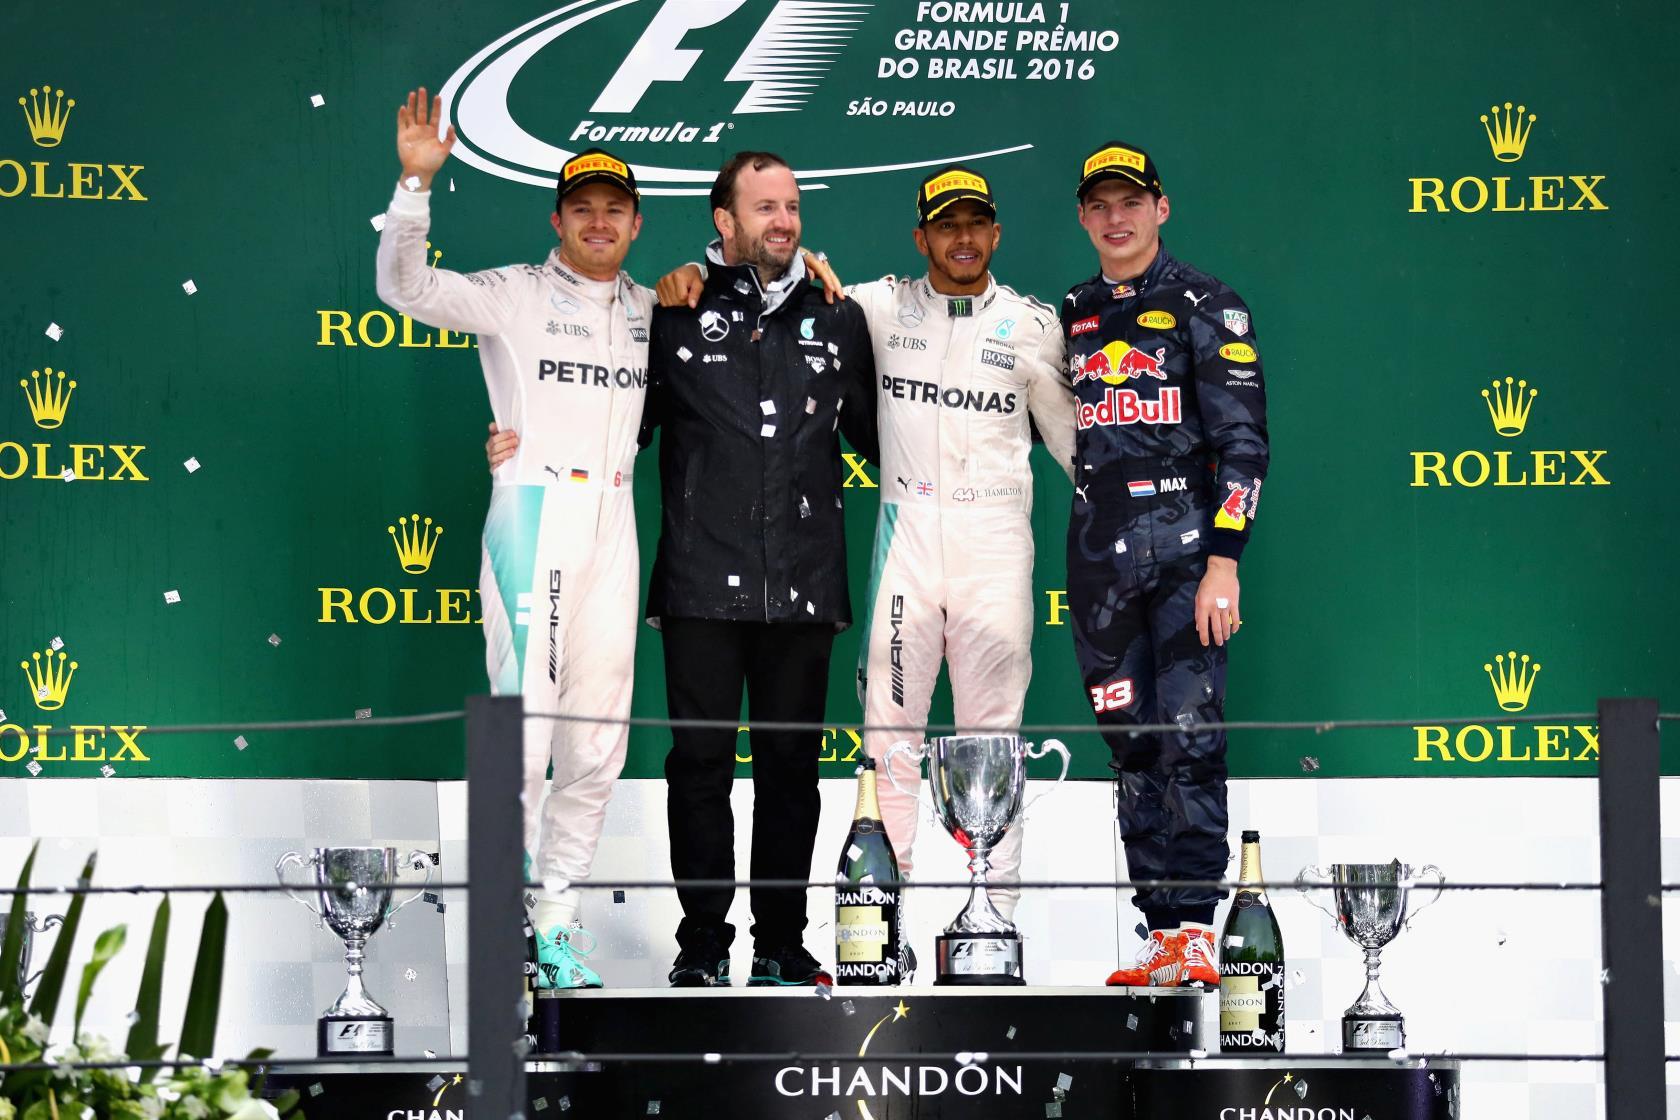 brazil-f1-2016-podium-foto-red-bull